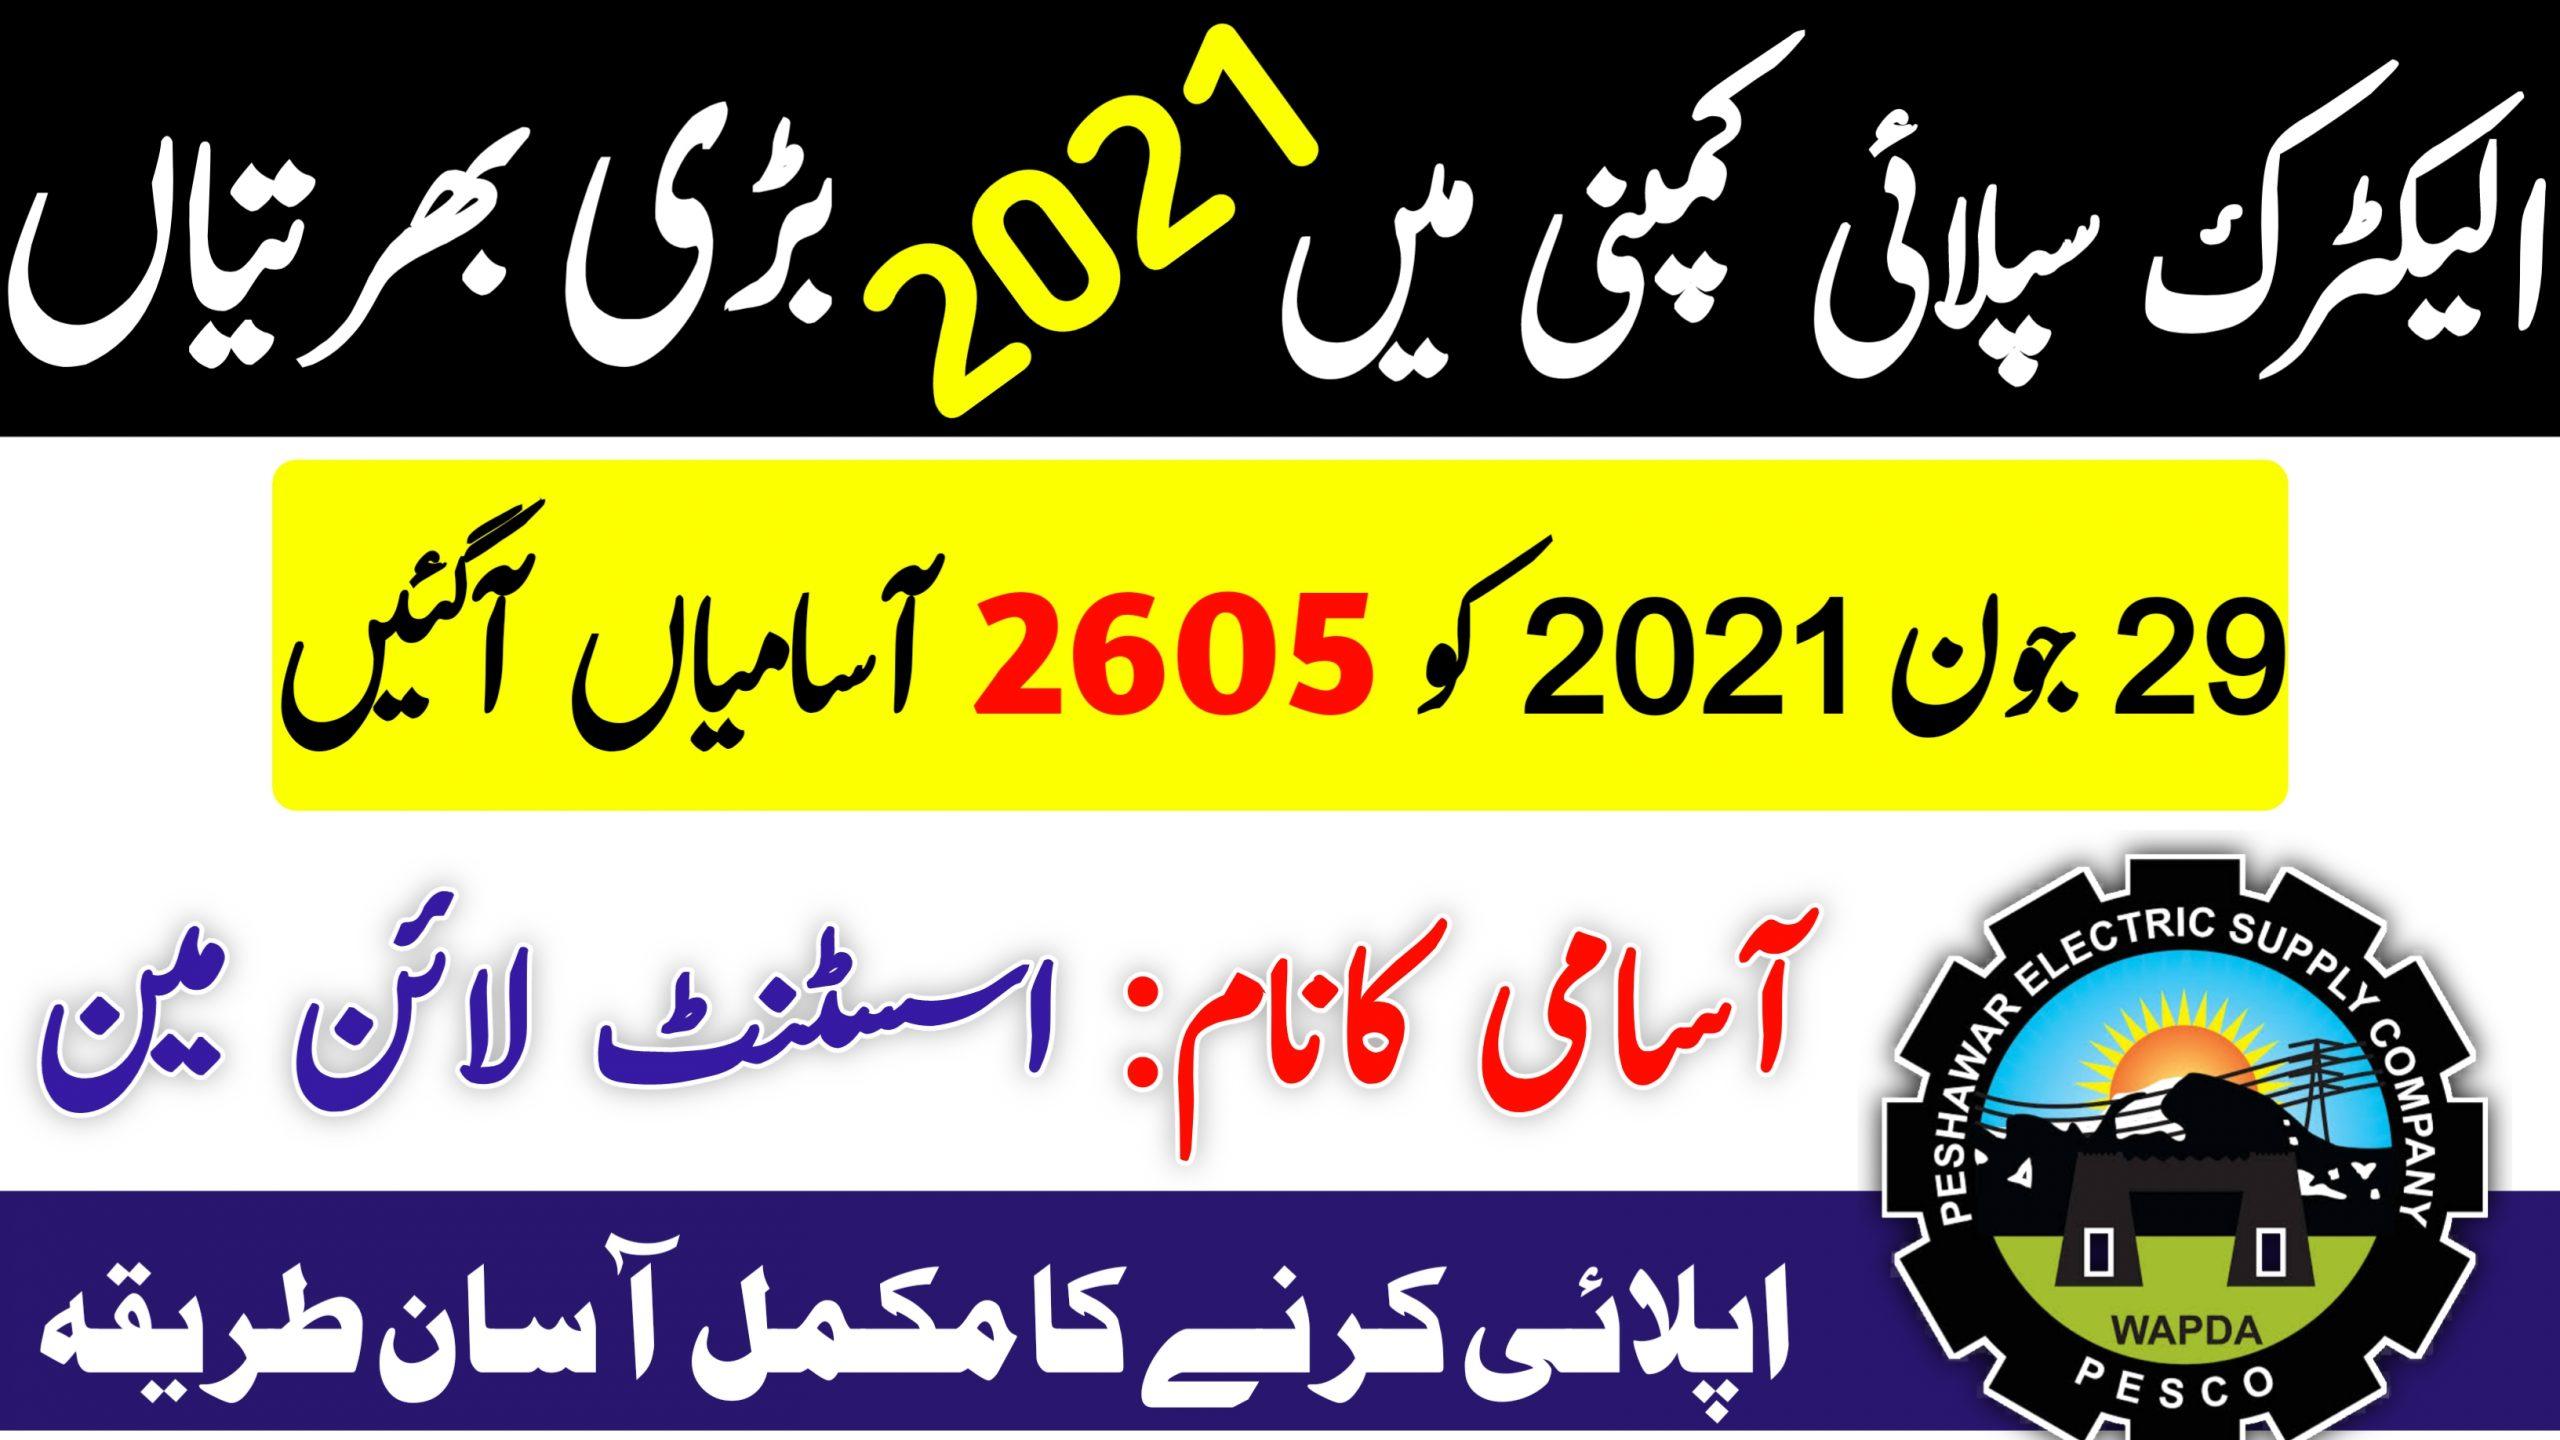 PESCO Jobs 2021 | Jobs in Peshawar 2021